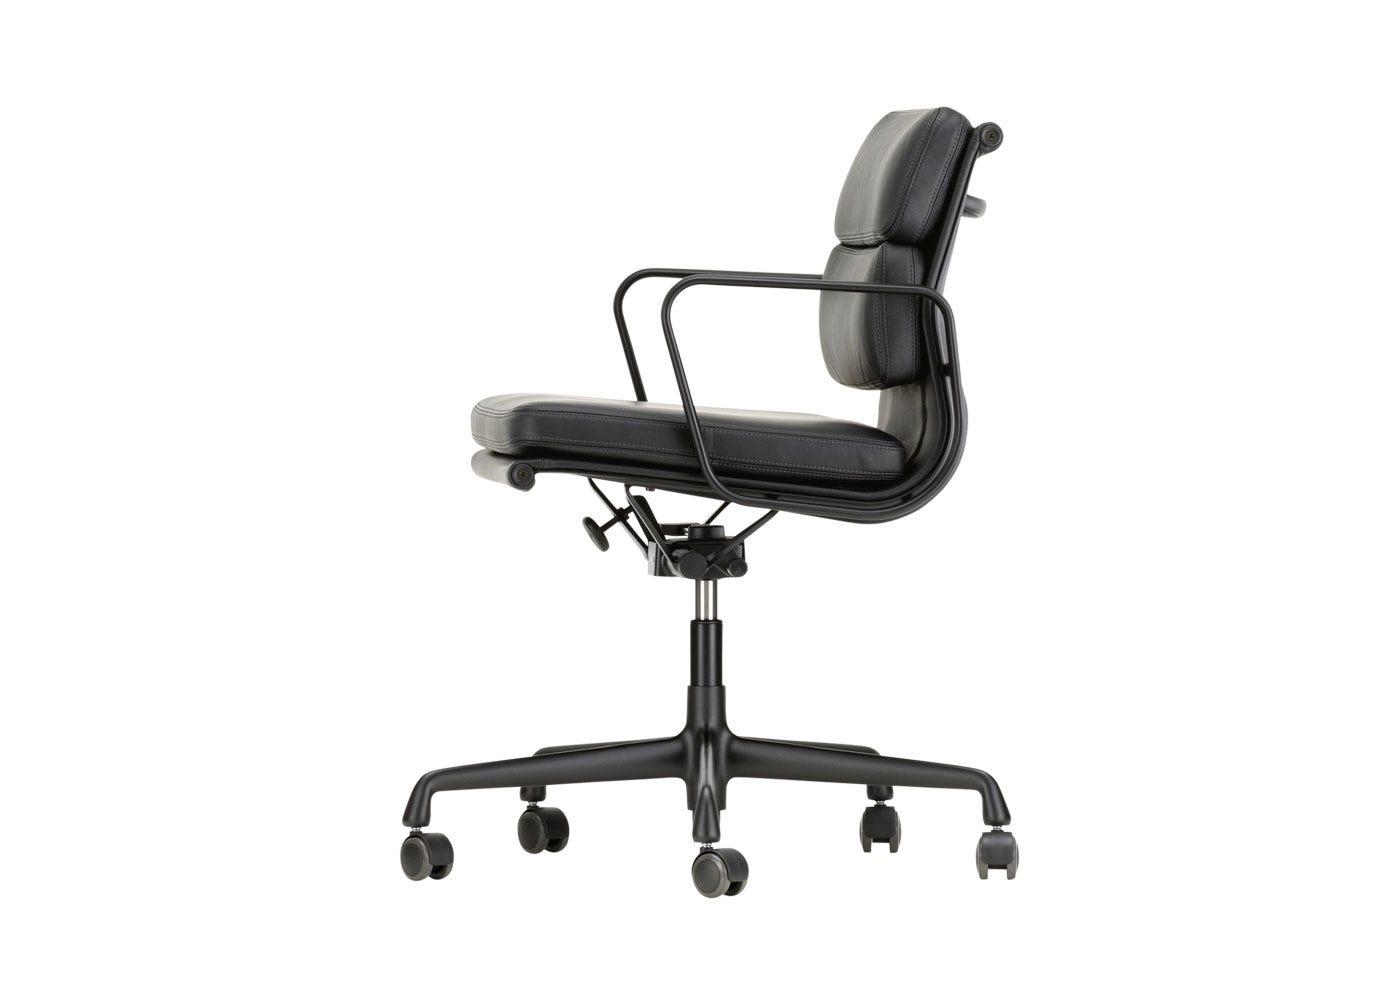 As Shown: Eames EA217 Soft Pad Chair Medium High Backrest Side Profile